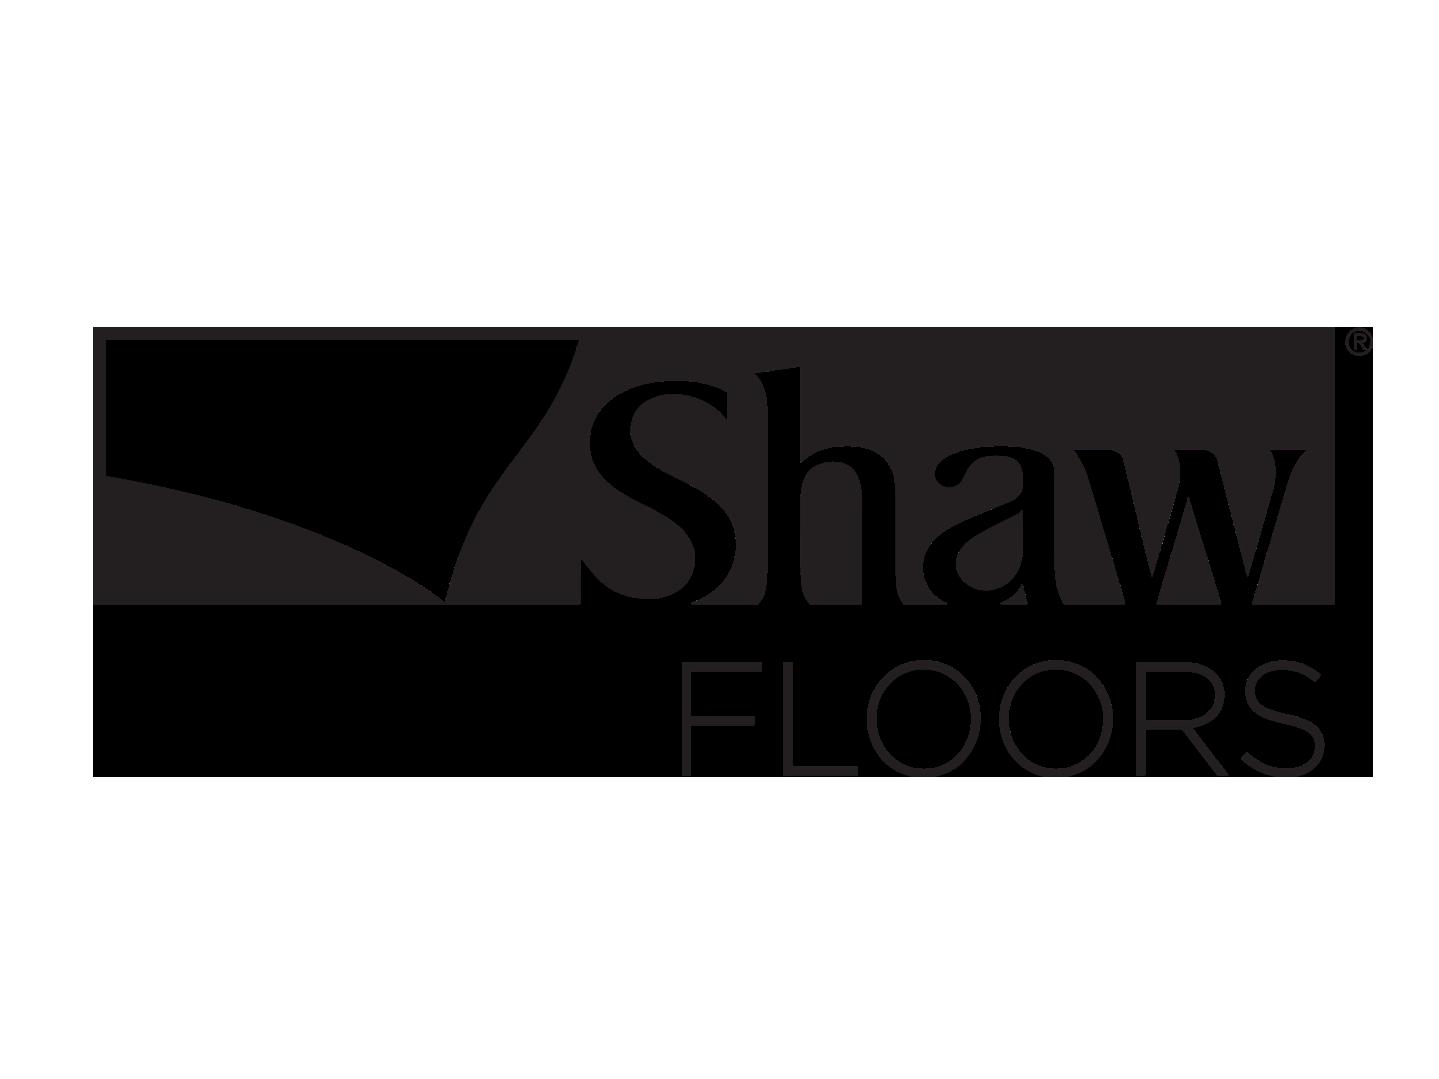 Shaw Floors 2019.png